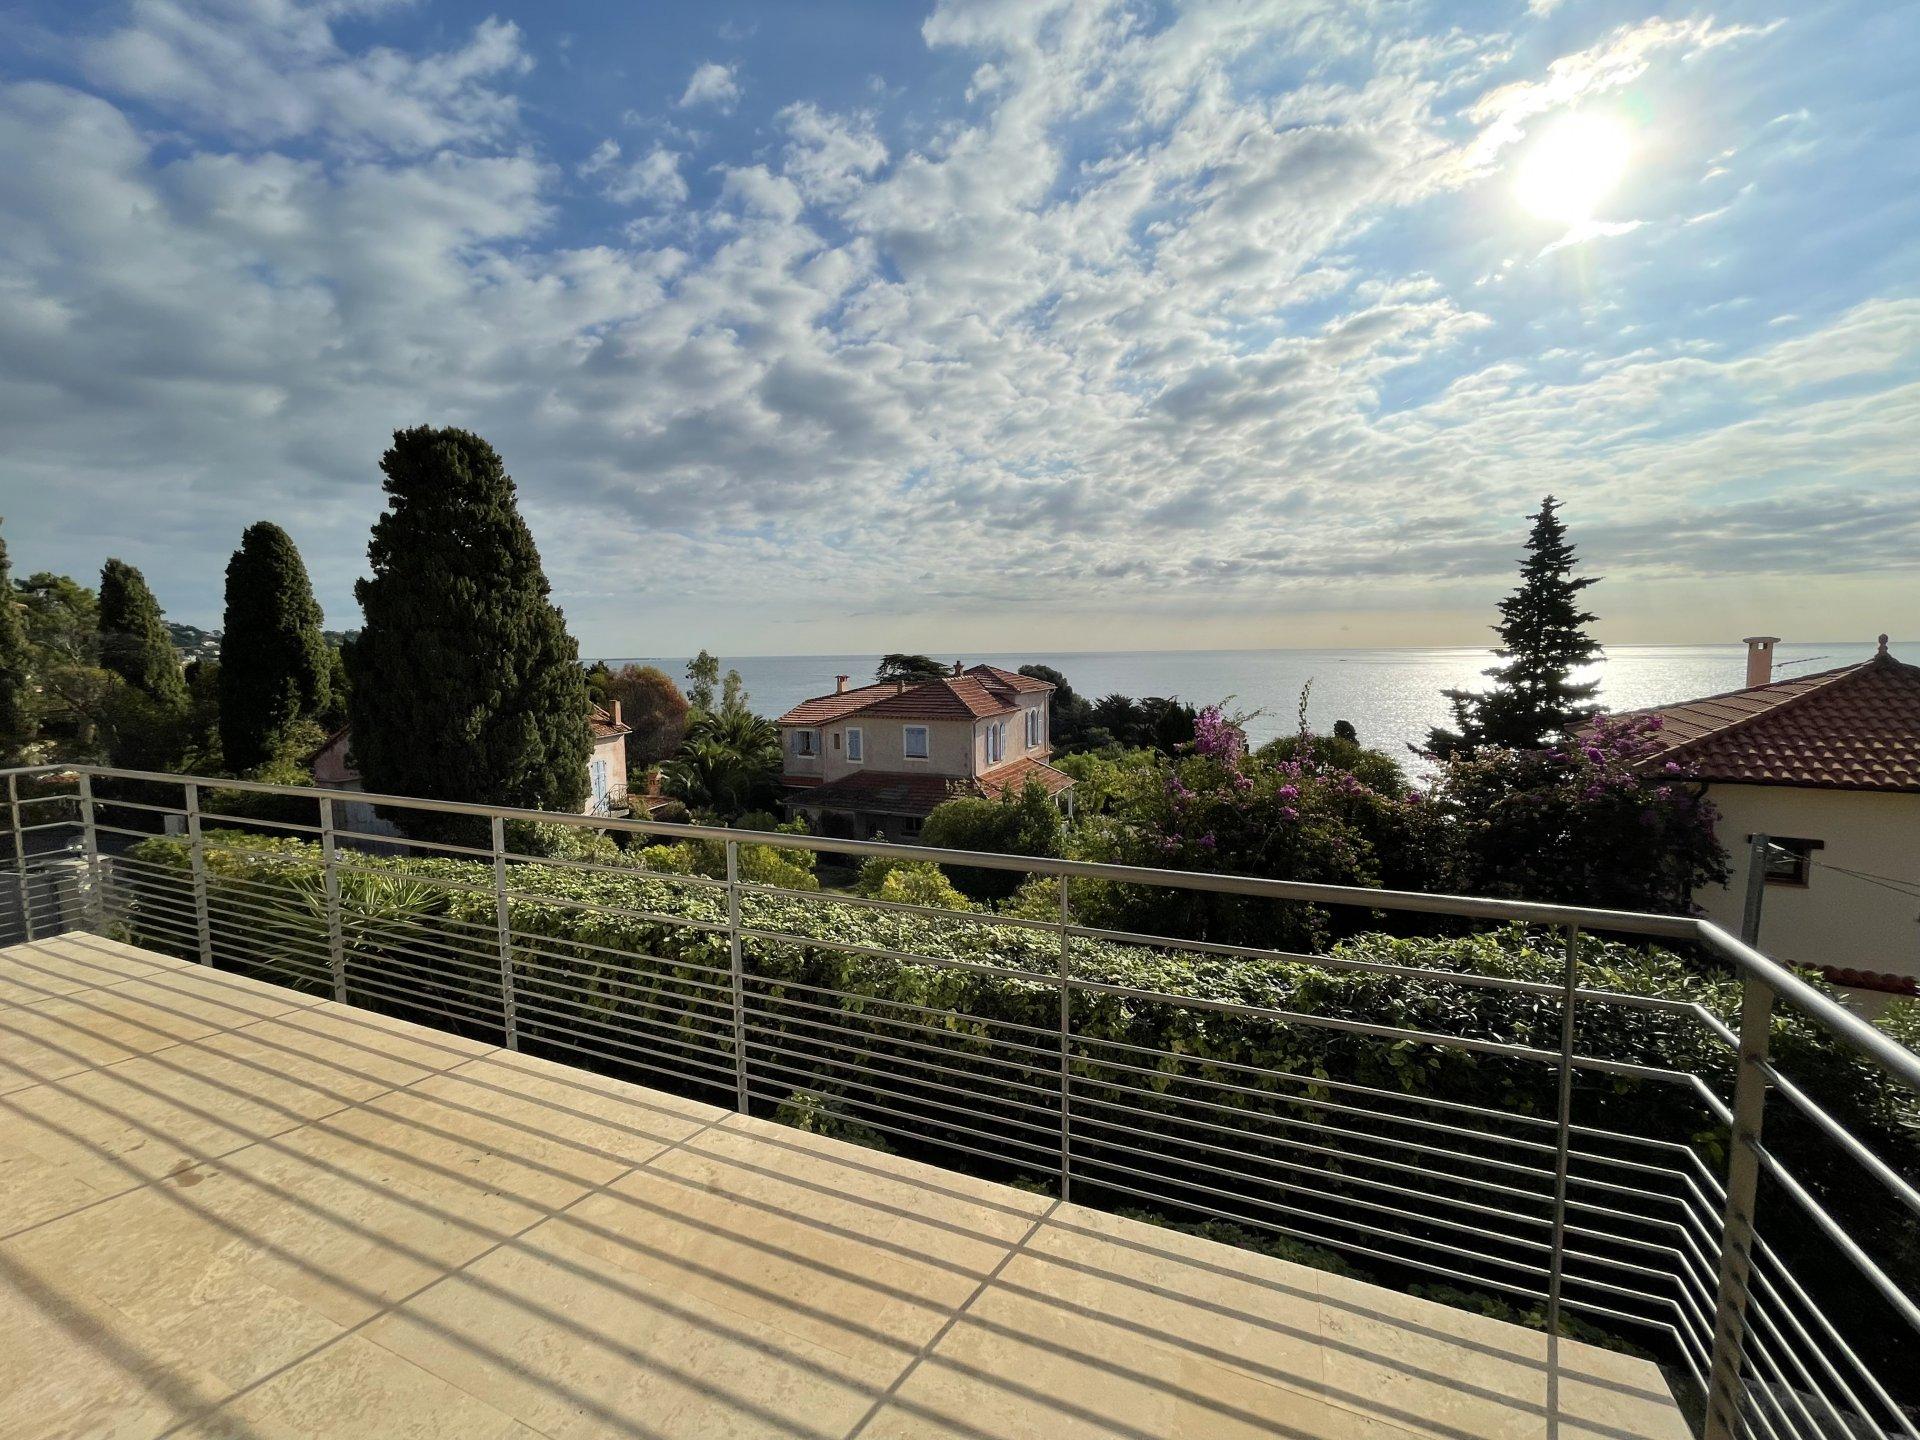 Villa havudsigt 4 soveværelser 143 m²